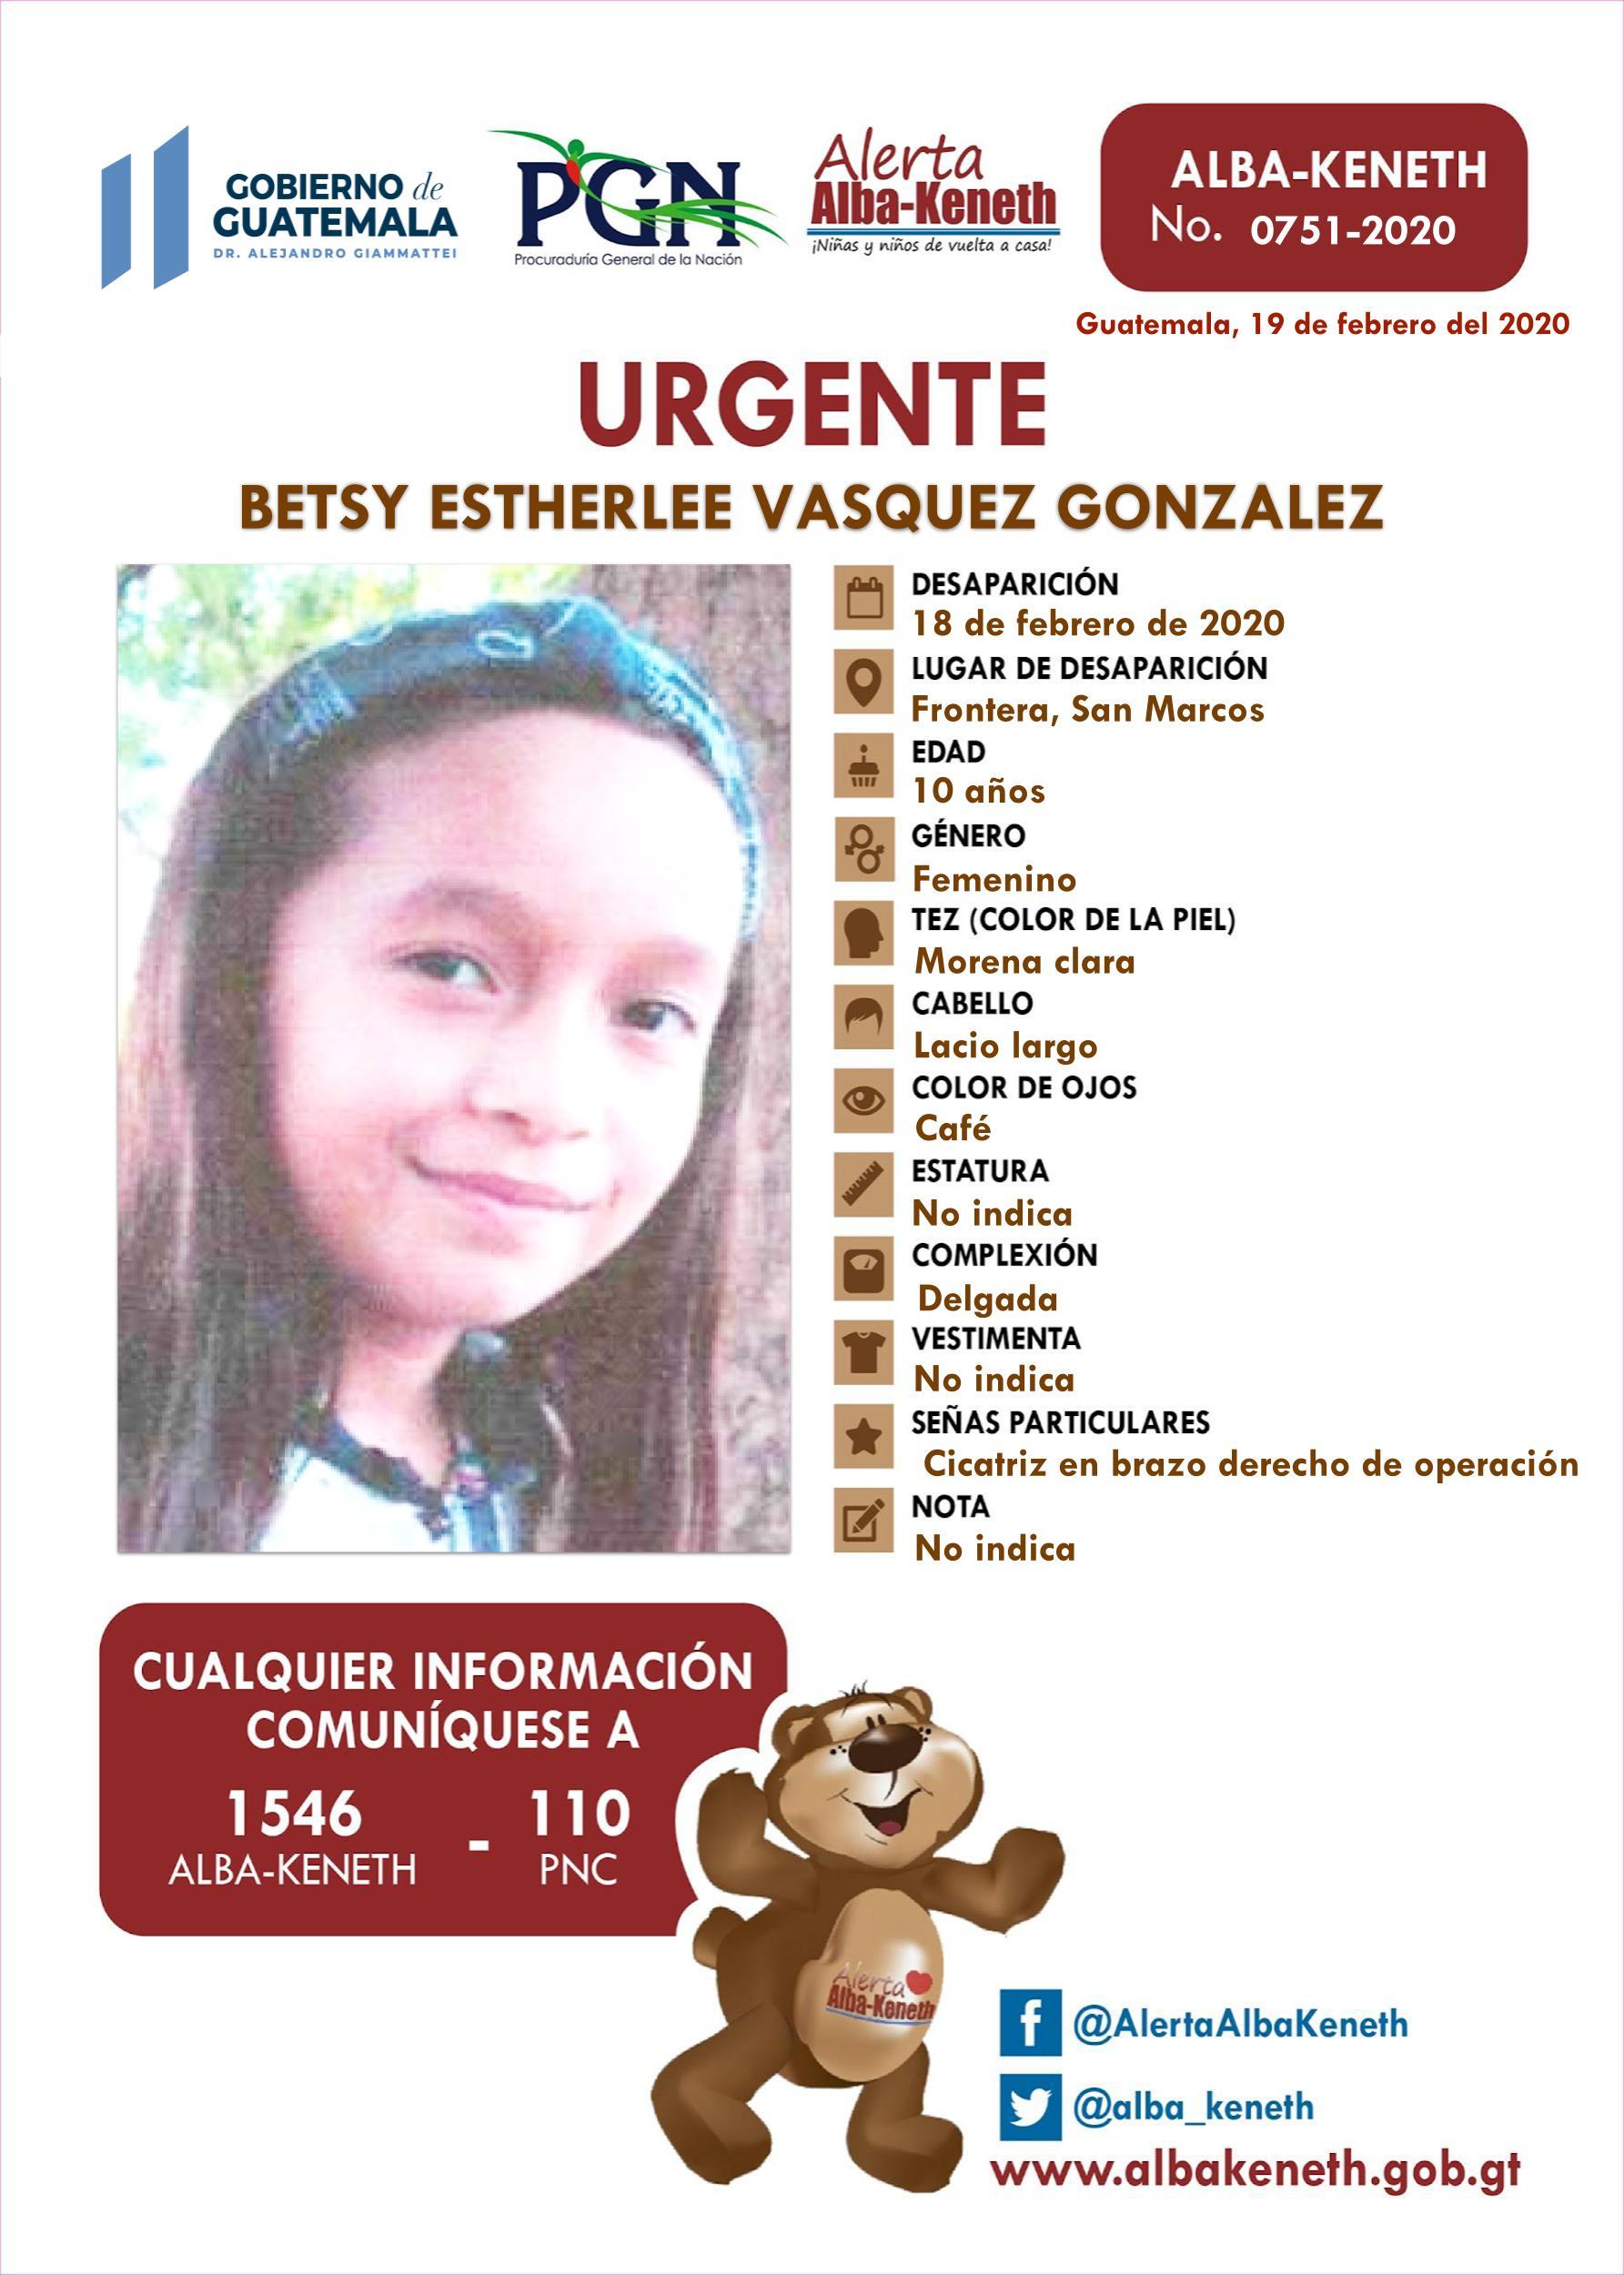 Betsy Estherlee Vasquez Gonzalez